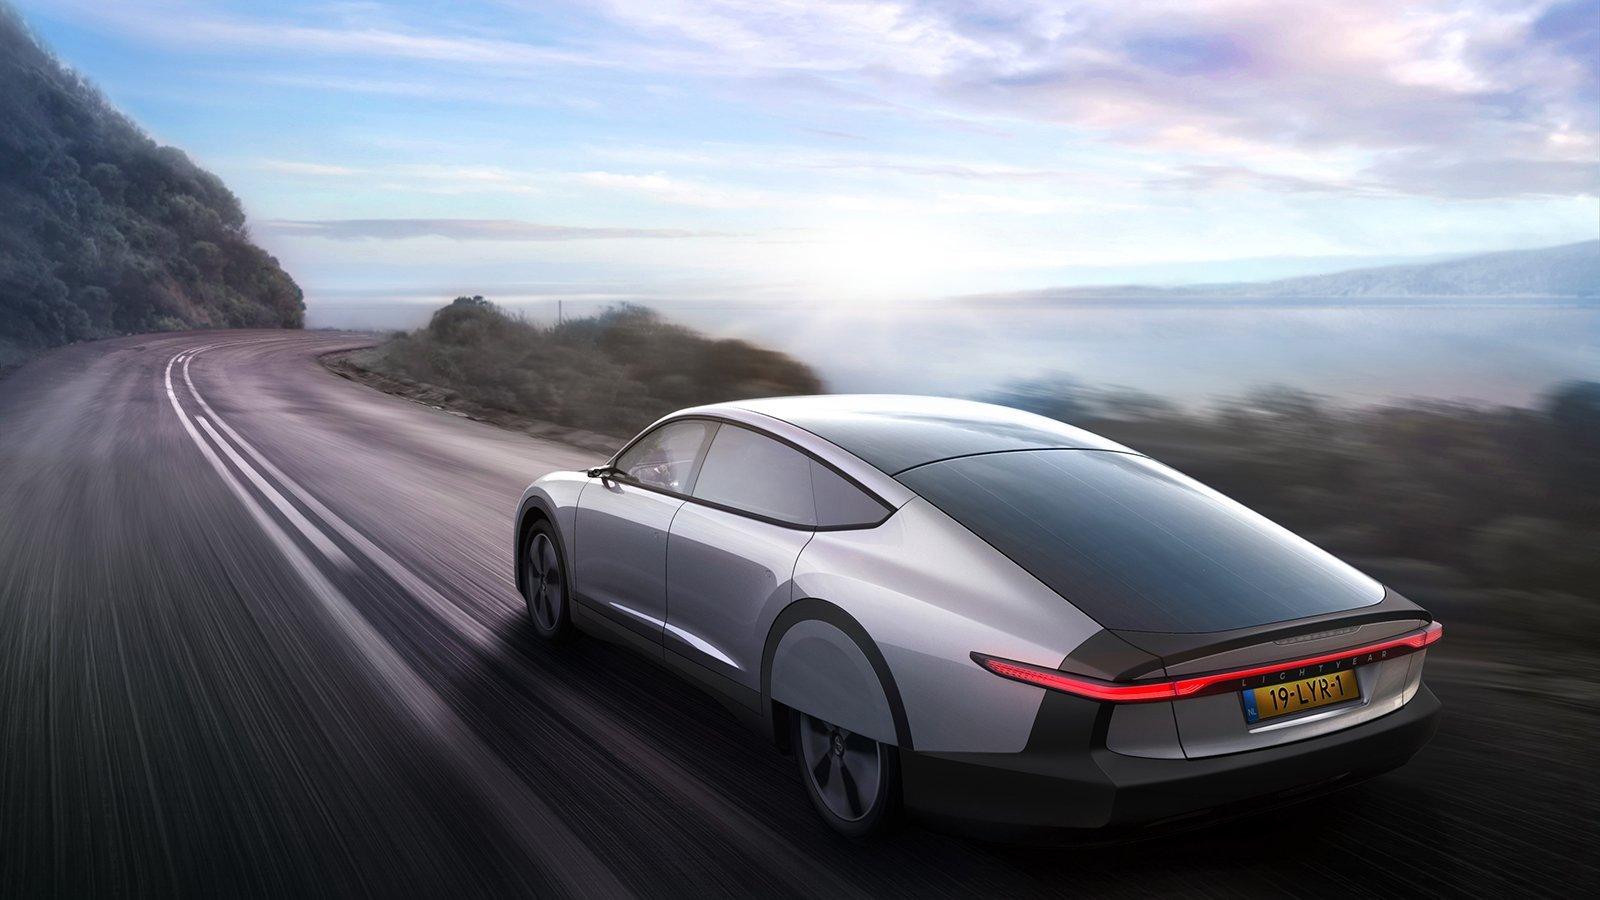 Dutch company develops partly solar powered car